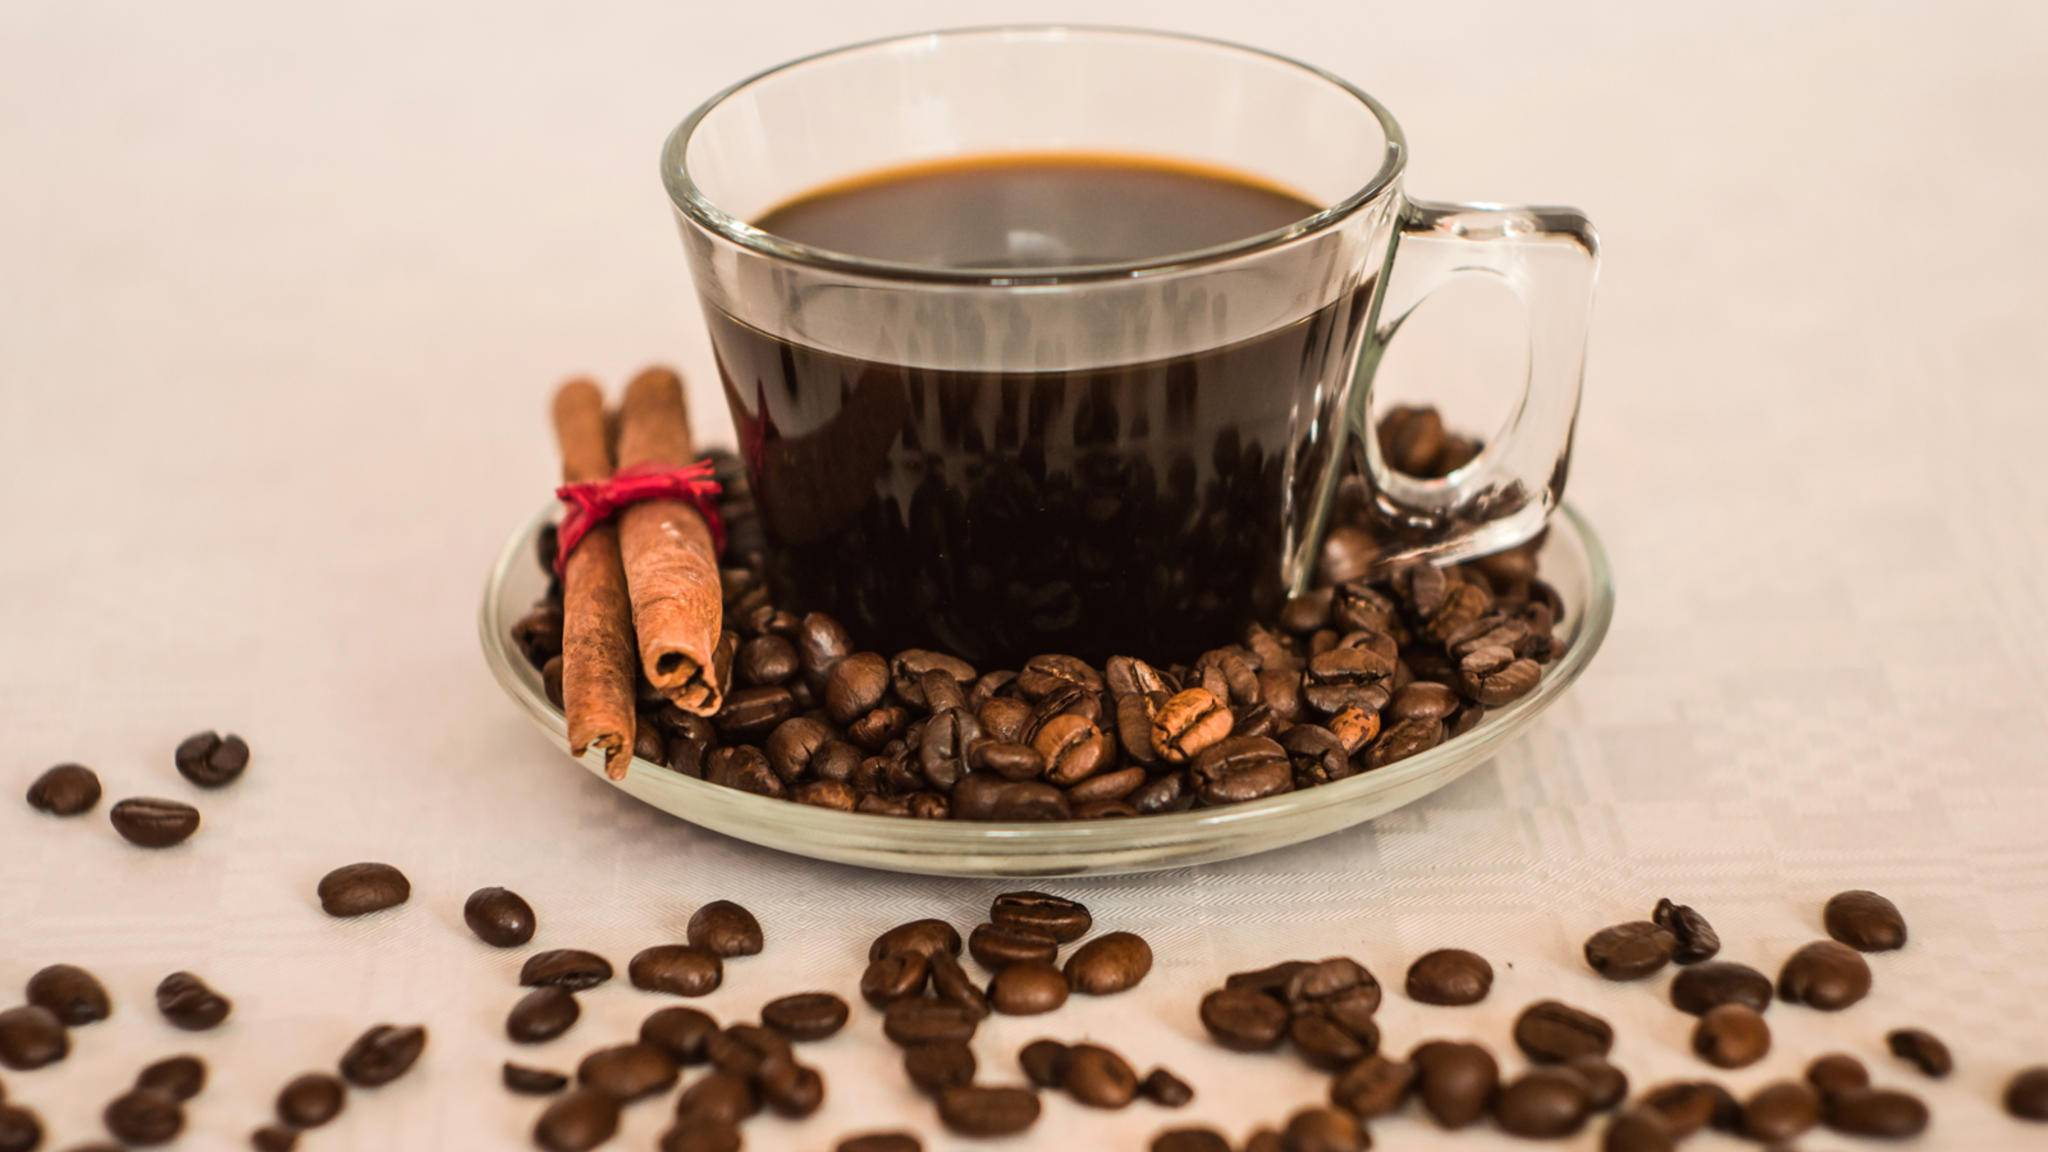 filterkaffee kochen 6 tipps f r den perfekten kaffeegenuss. Black Bedroom Furniture Sets. Home Design Ideas